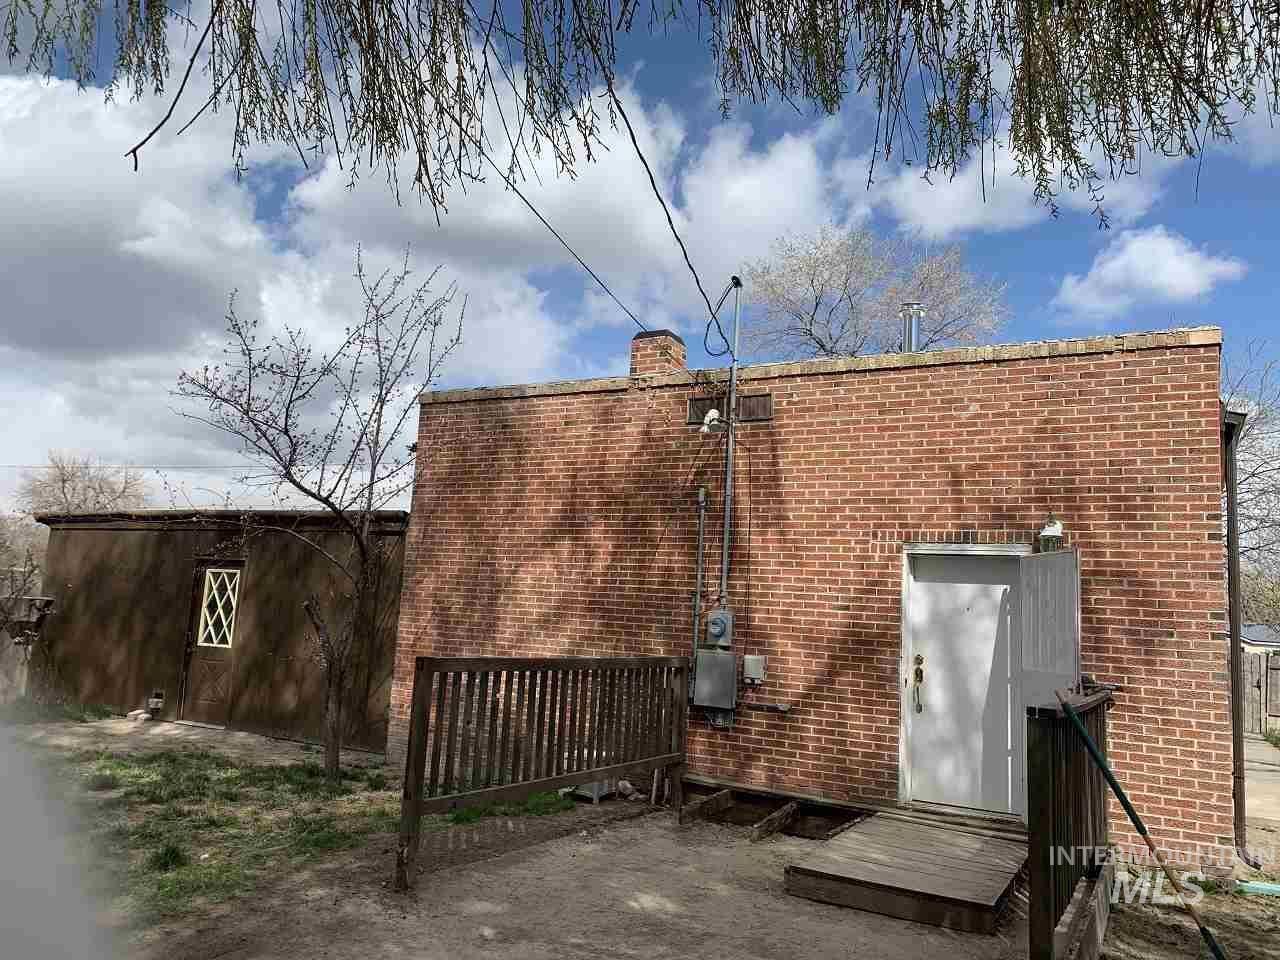 Photo of 1851 J Street, Heyburn, ID 83336-0000 (MLS # 98764498)